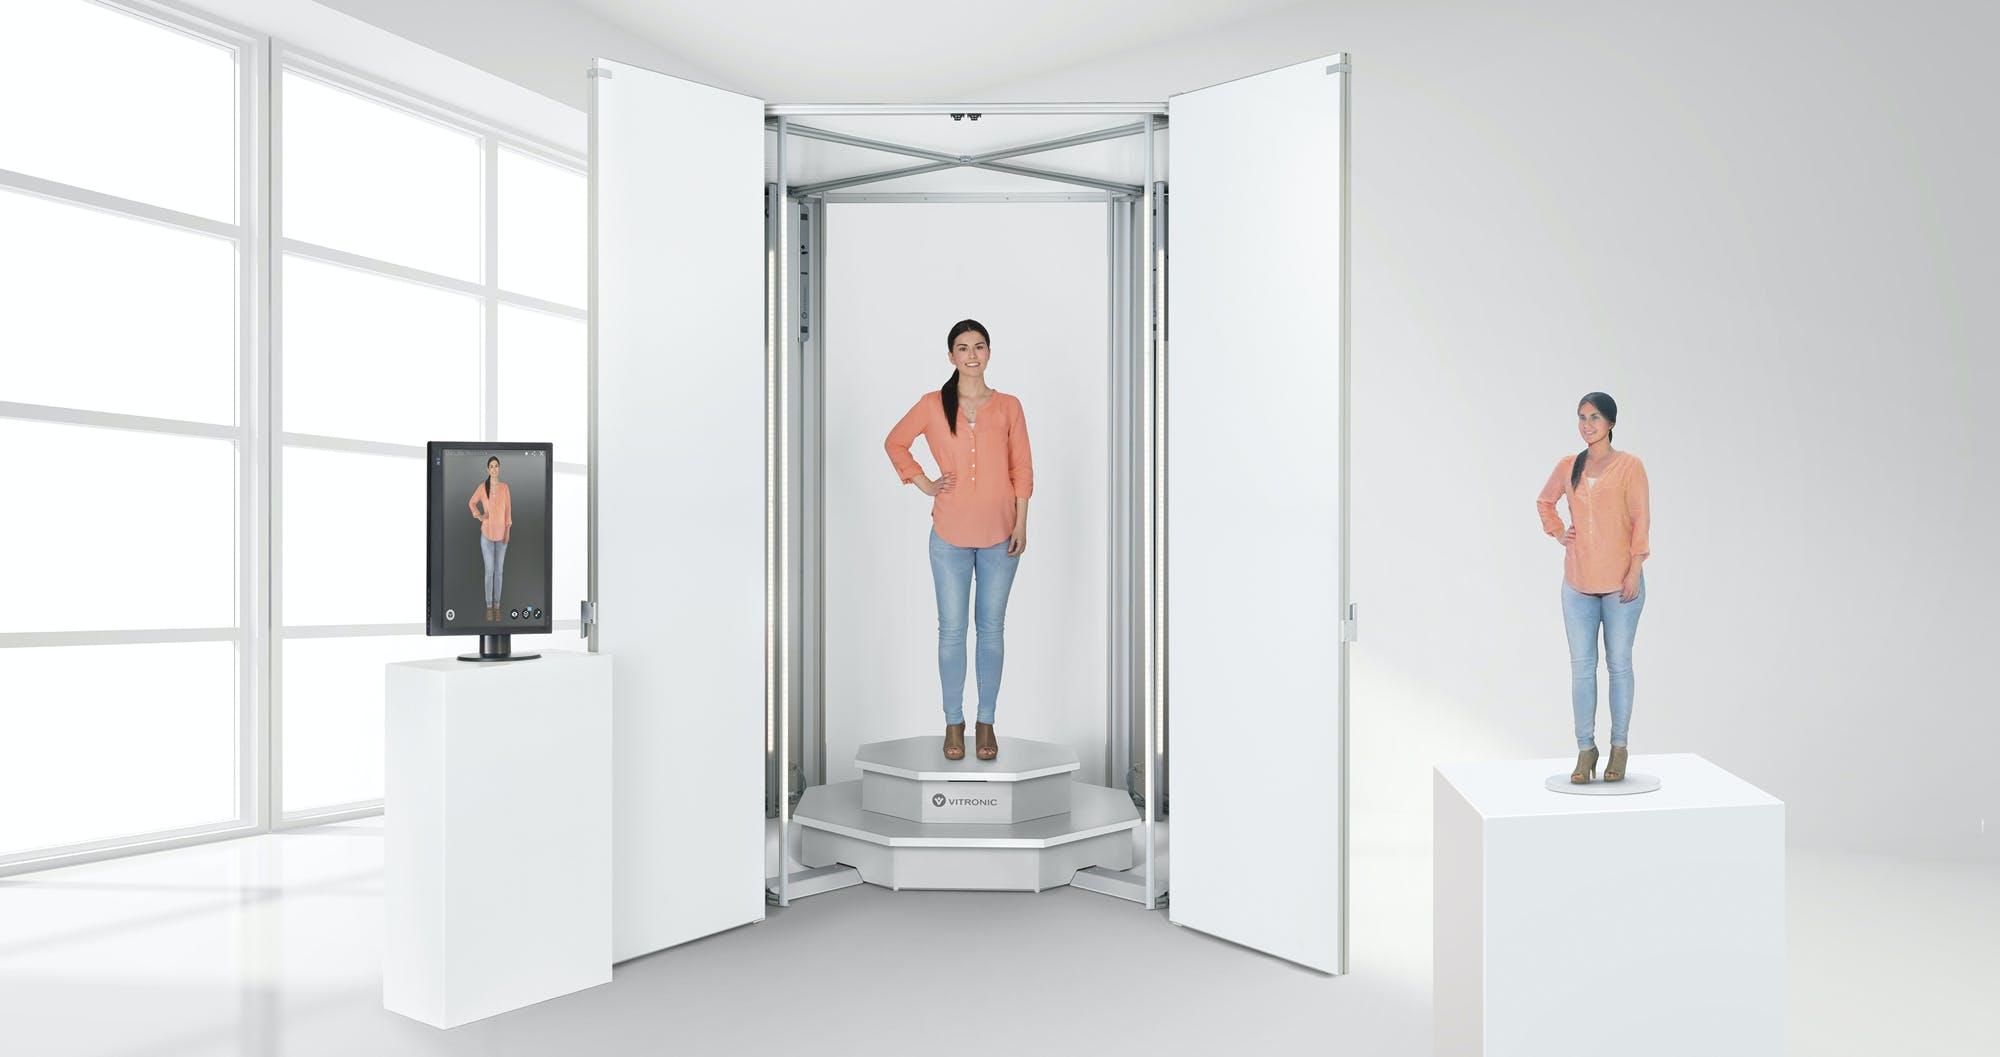 VITRONIC 3D Bodyscan